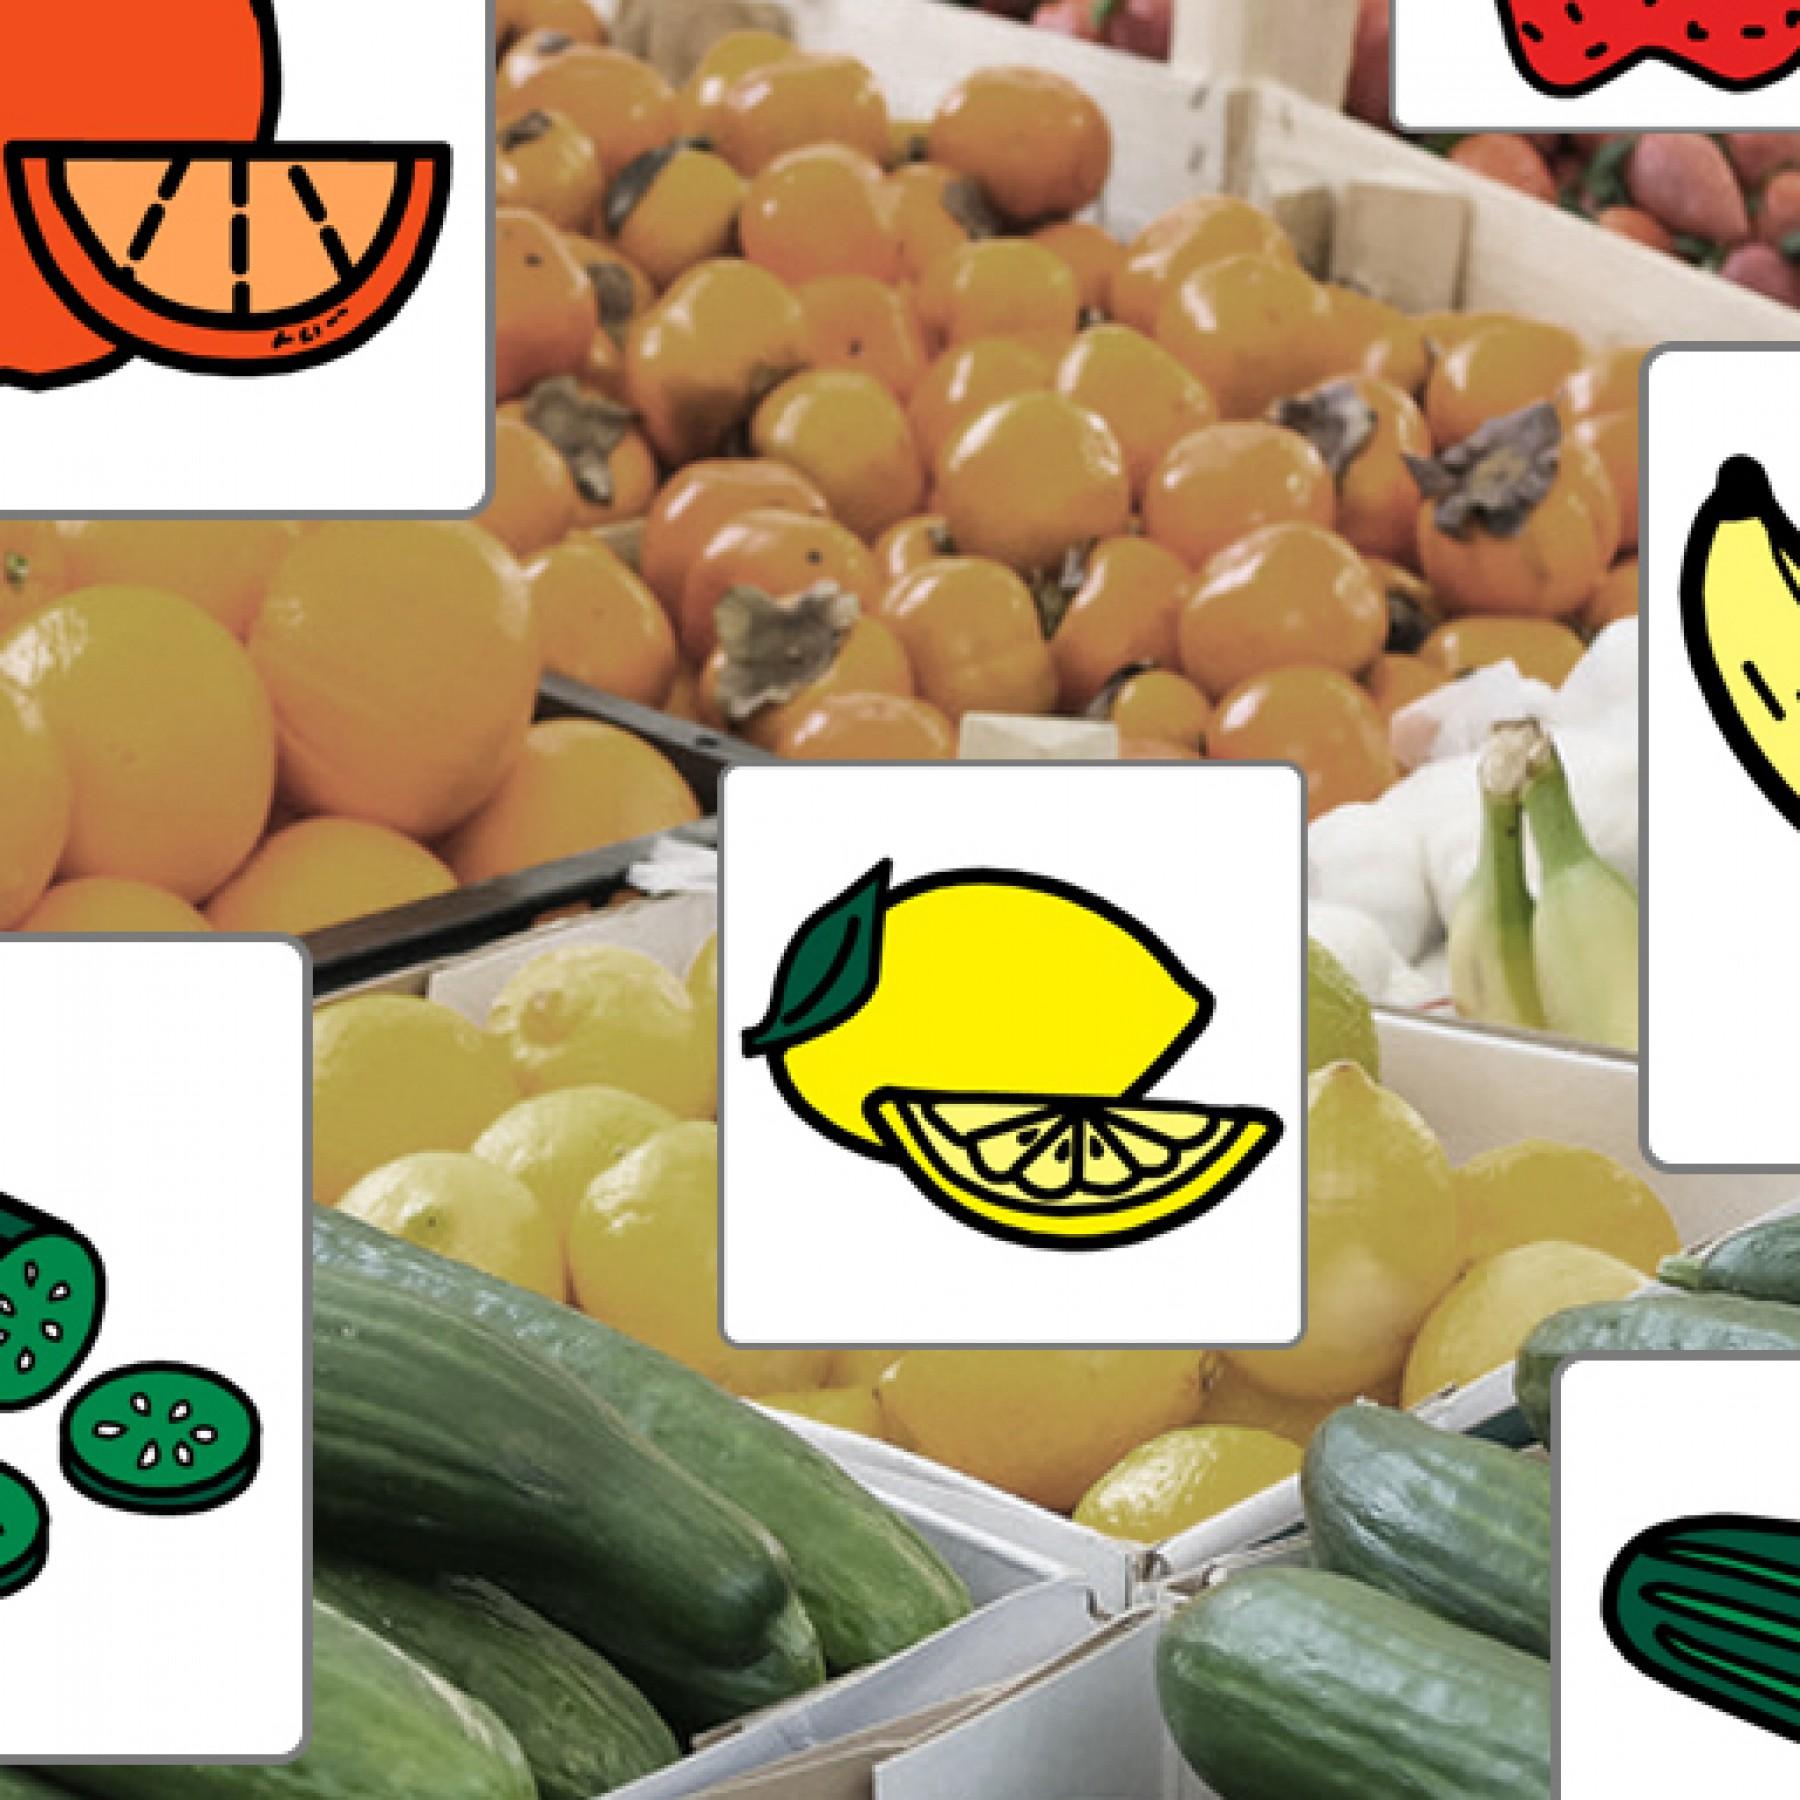 fruit-market-symbols-food-drink-kids-languages-life-skills-communication-education-main-location1